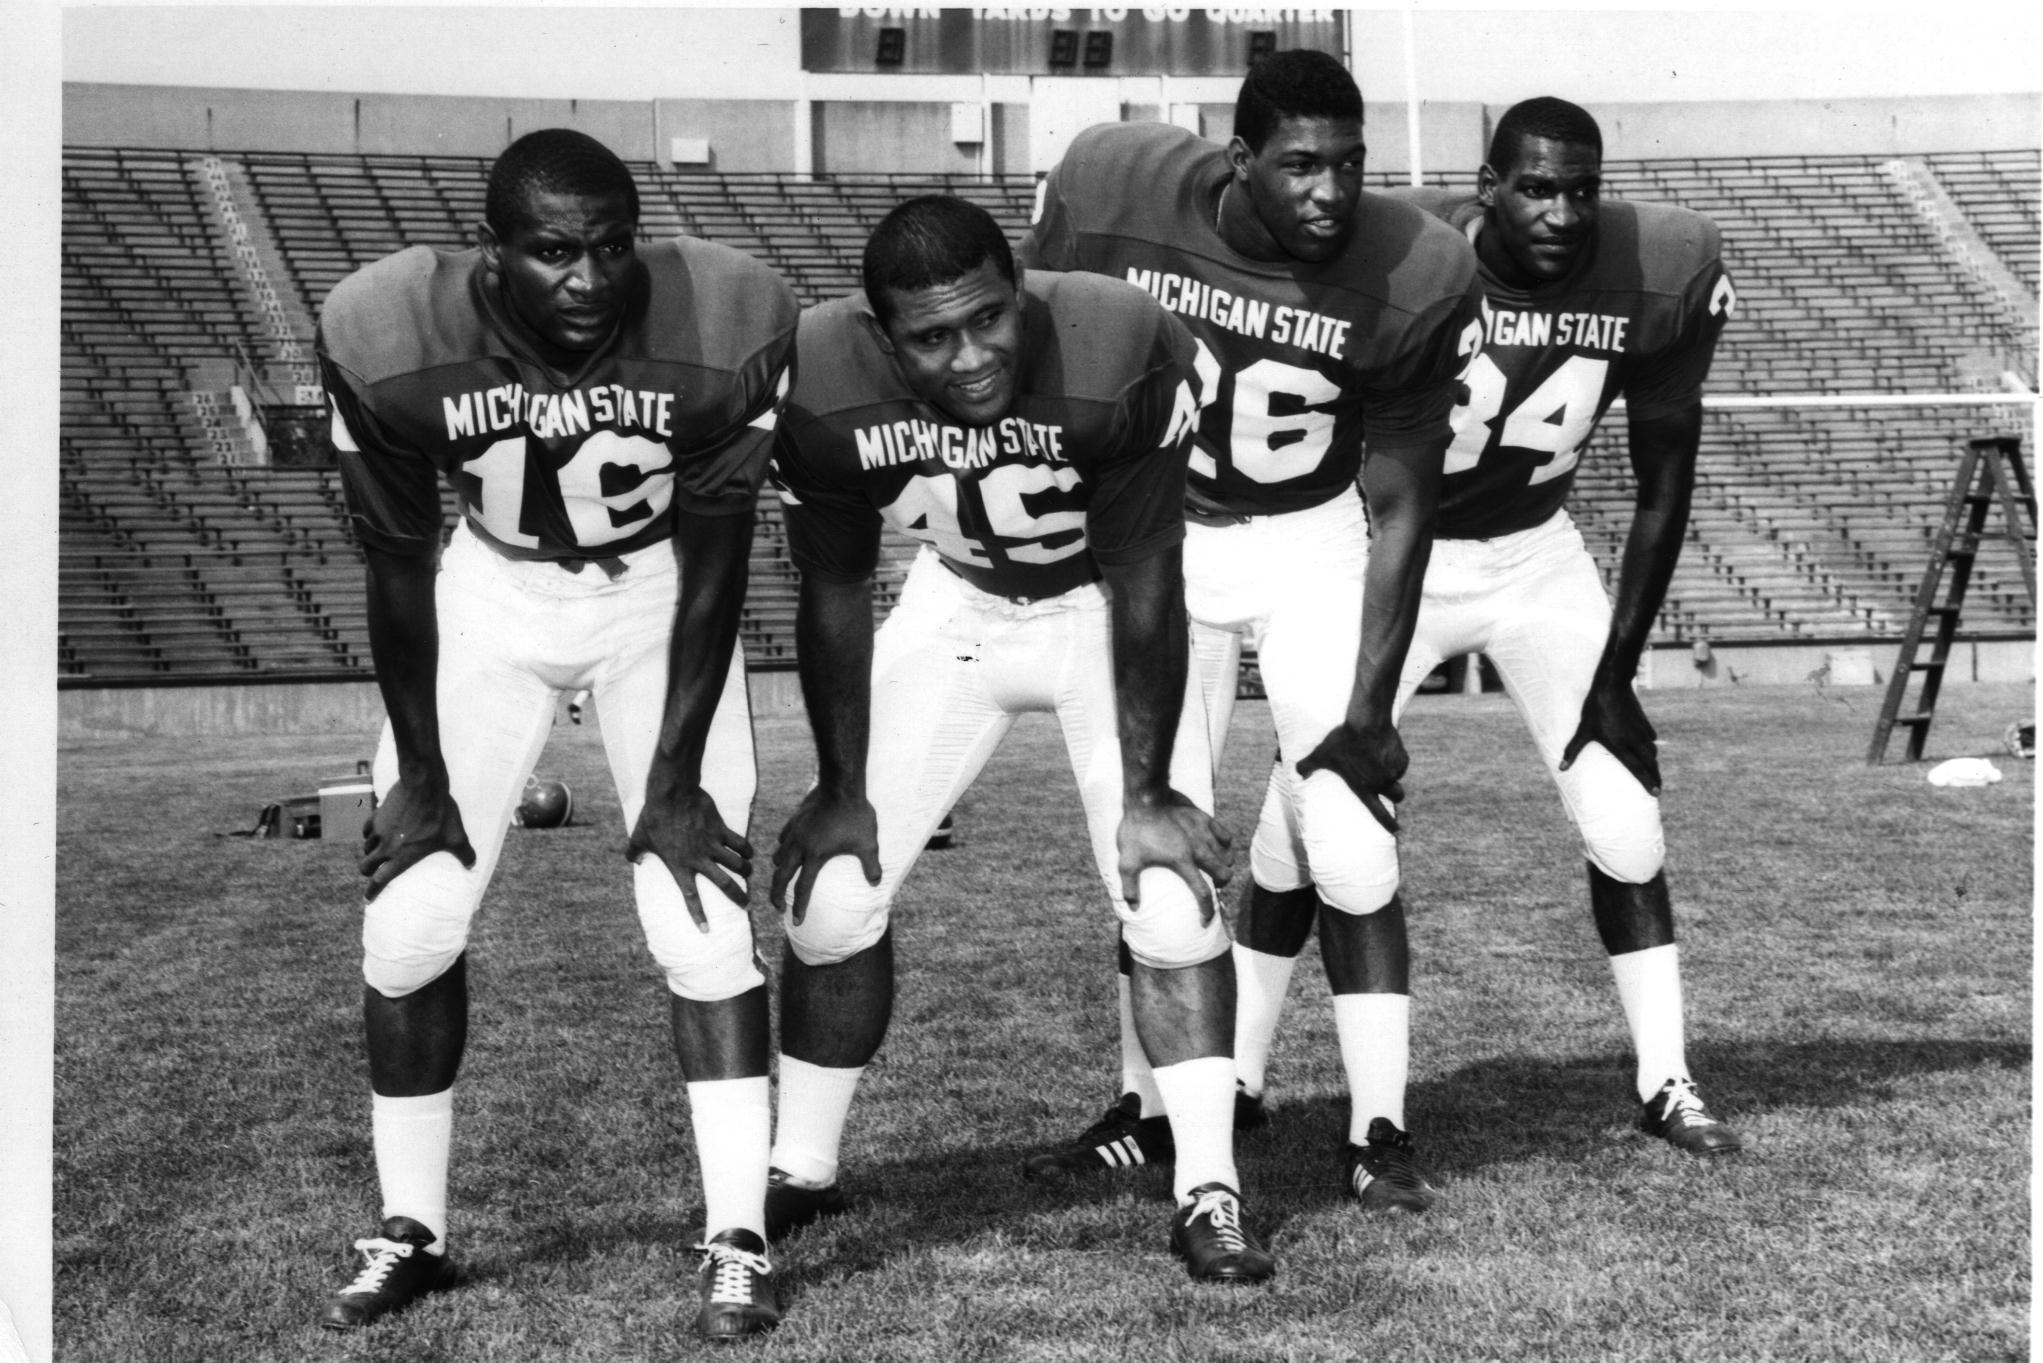 Michigan State Spartans 1966 Raye Apisa Jones Lee 34 Is My Husband Michigan State Football Michigan State Michigan State University